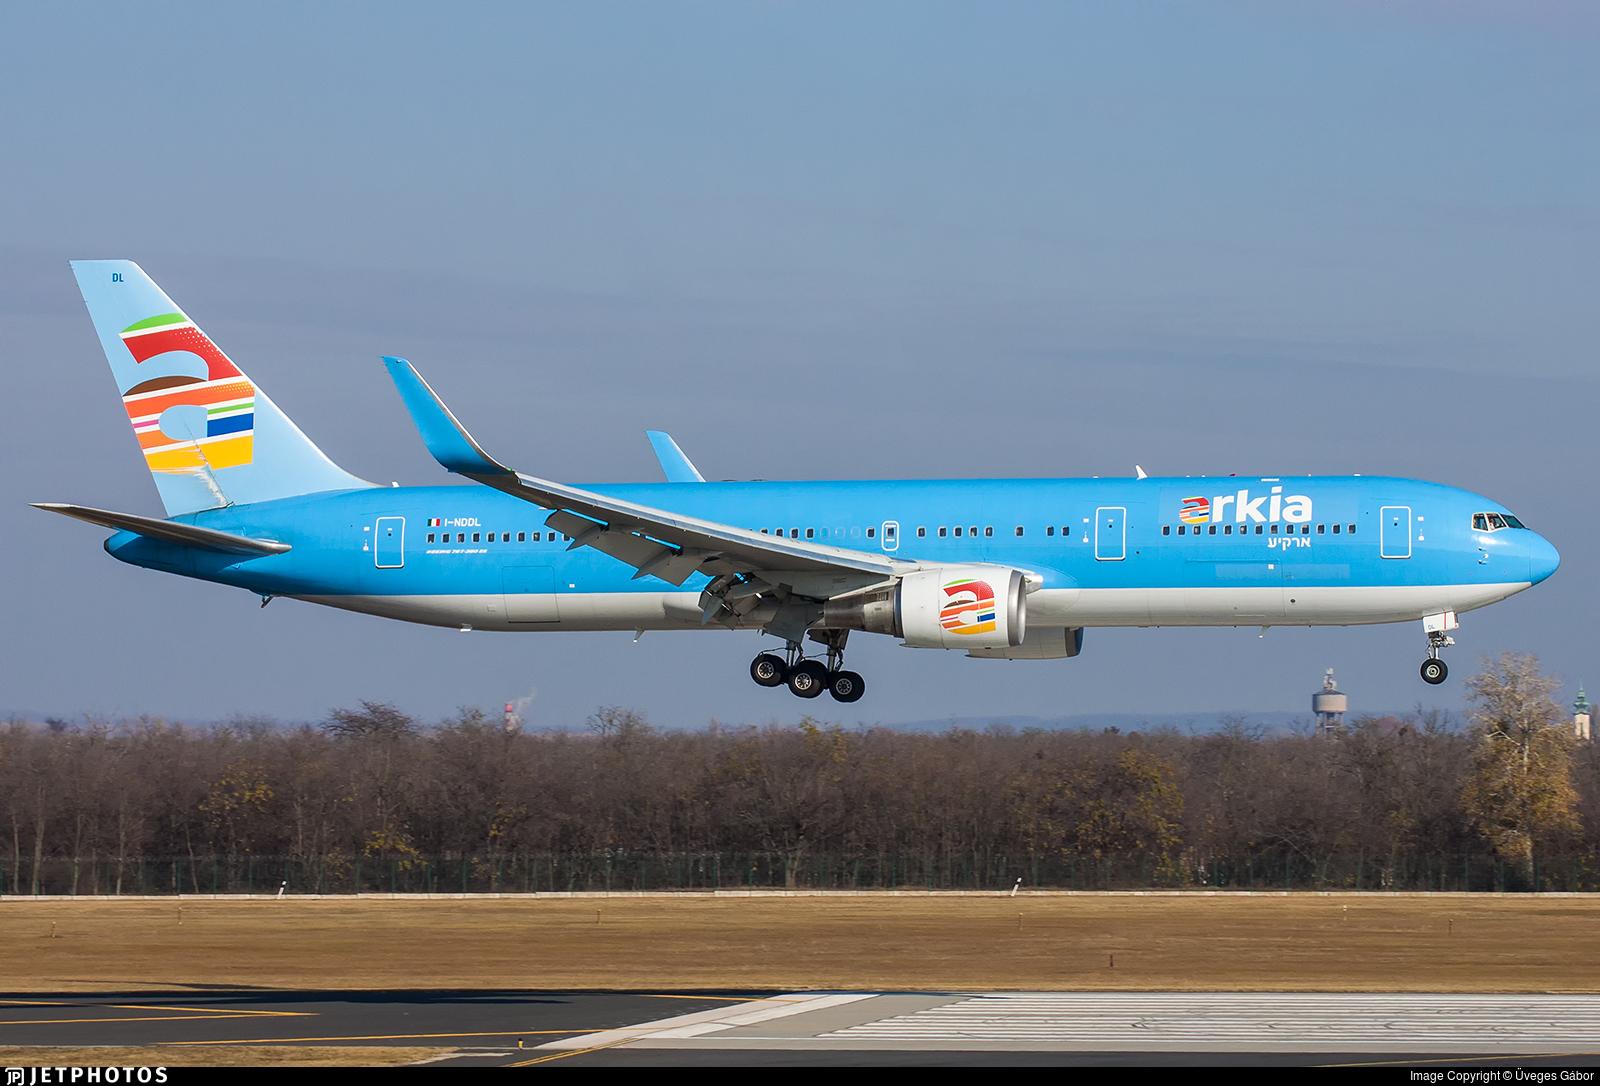 I-NDDL - Boeing 767-324(ER) - Arkia Israeli Airlines (Neos)